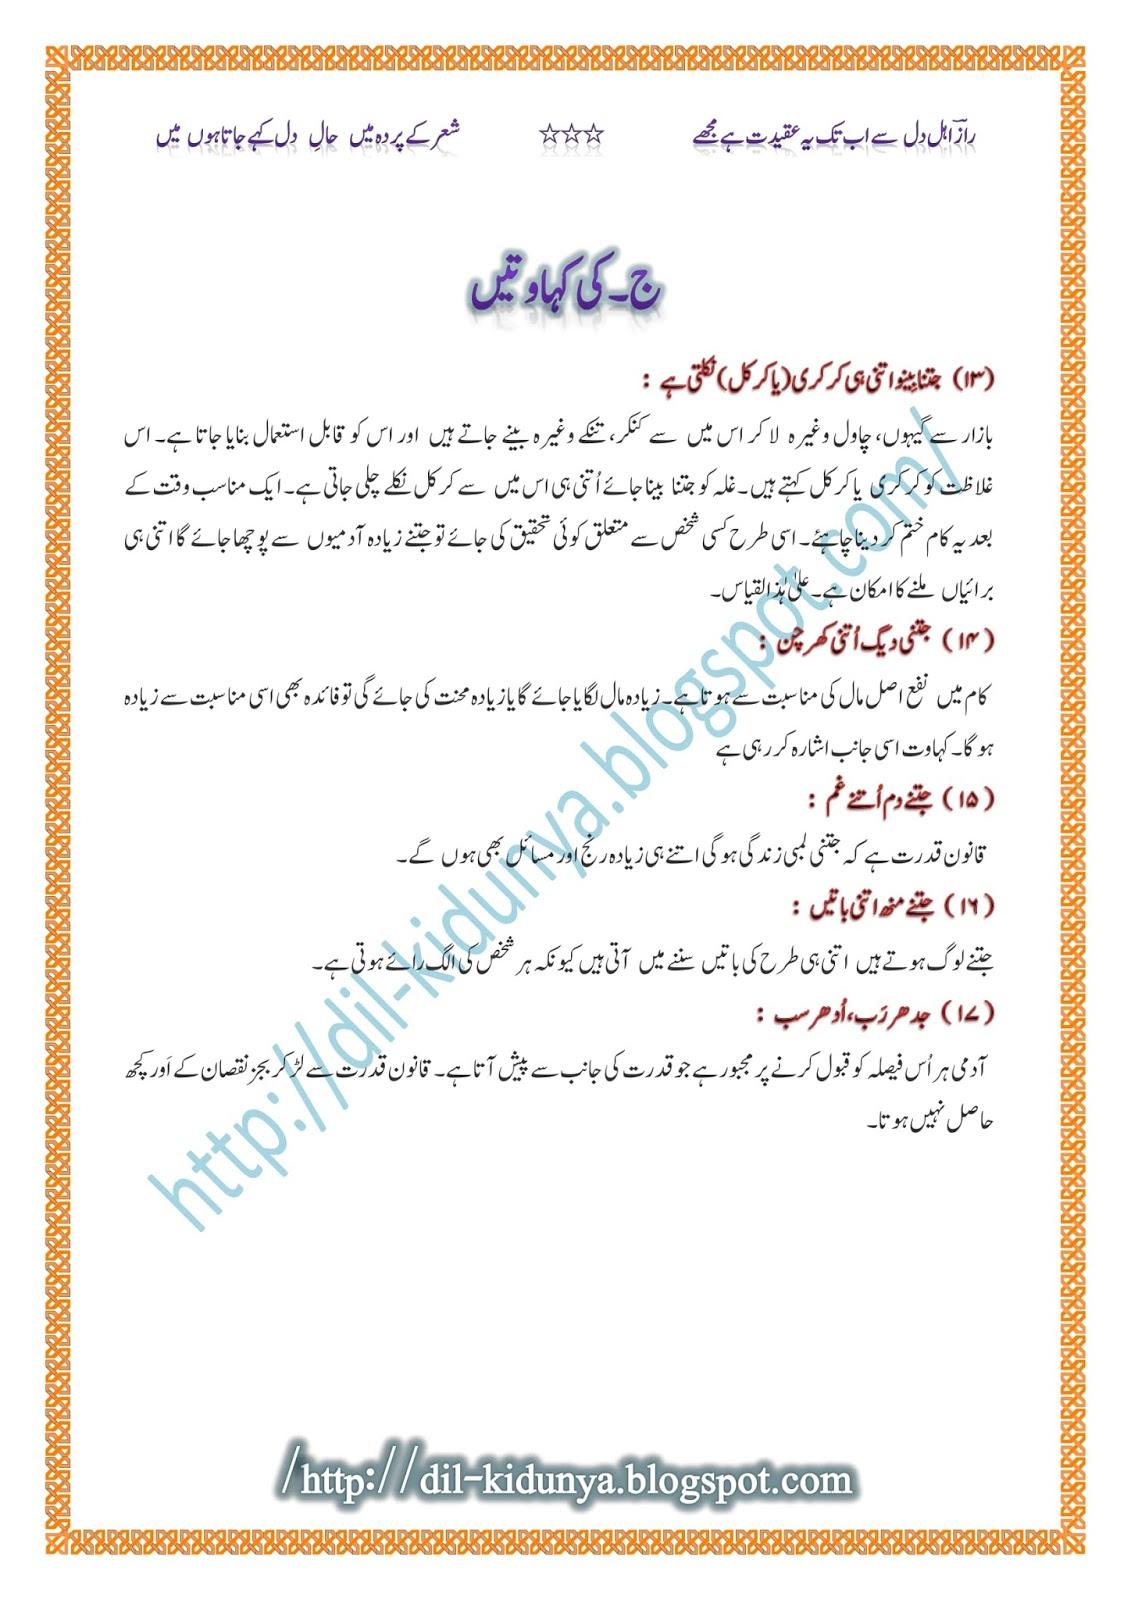 DIL KI DUNYA: اردو محاورے ،کہاوتیں، ضرب الامثال Urdu idioms